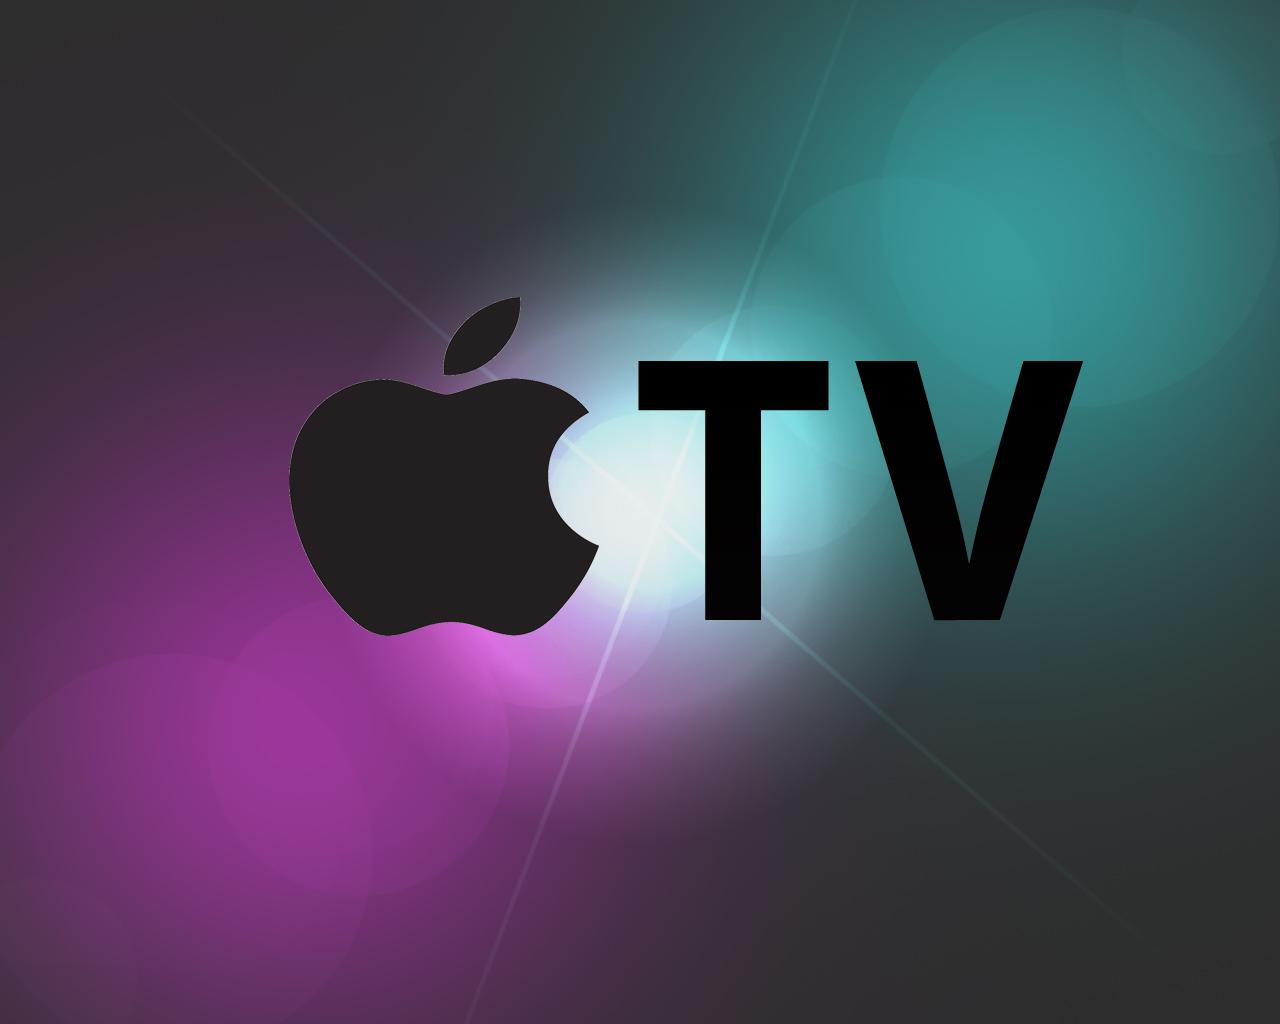 Apple tv logo Wallpaper